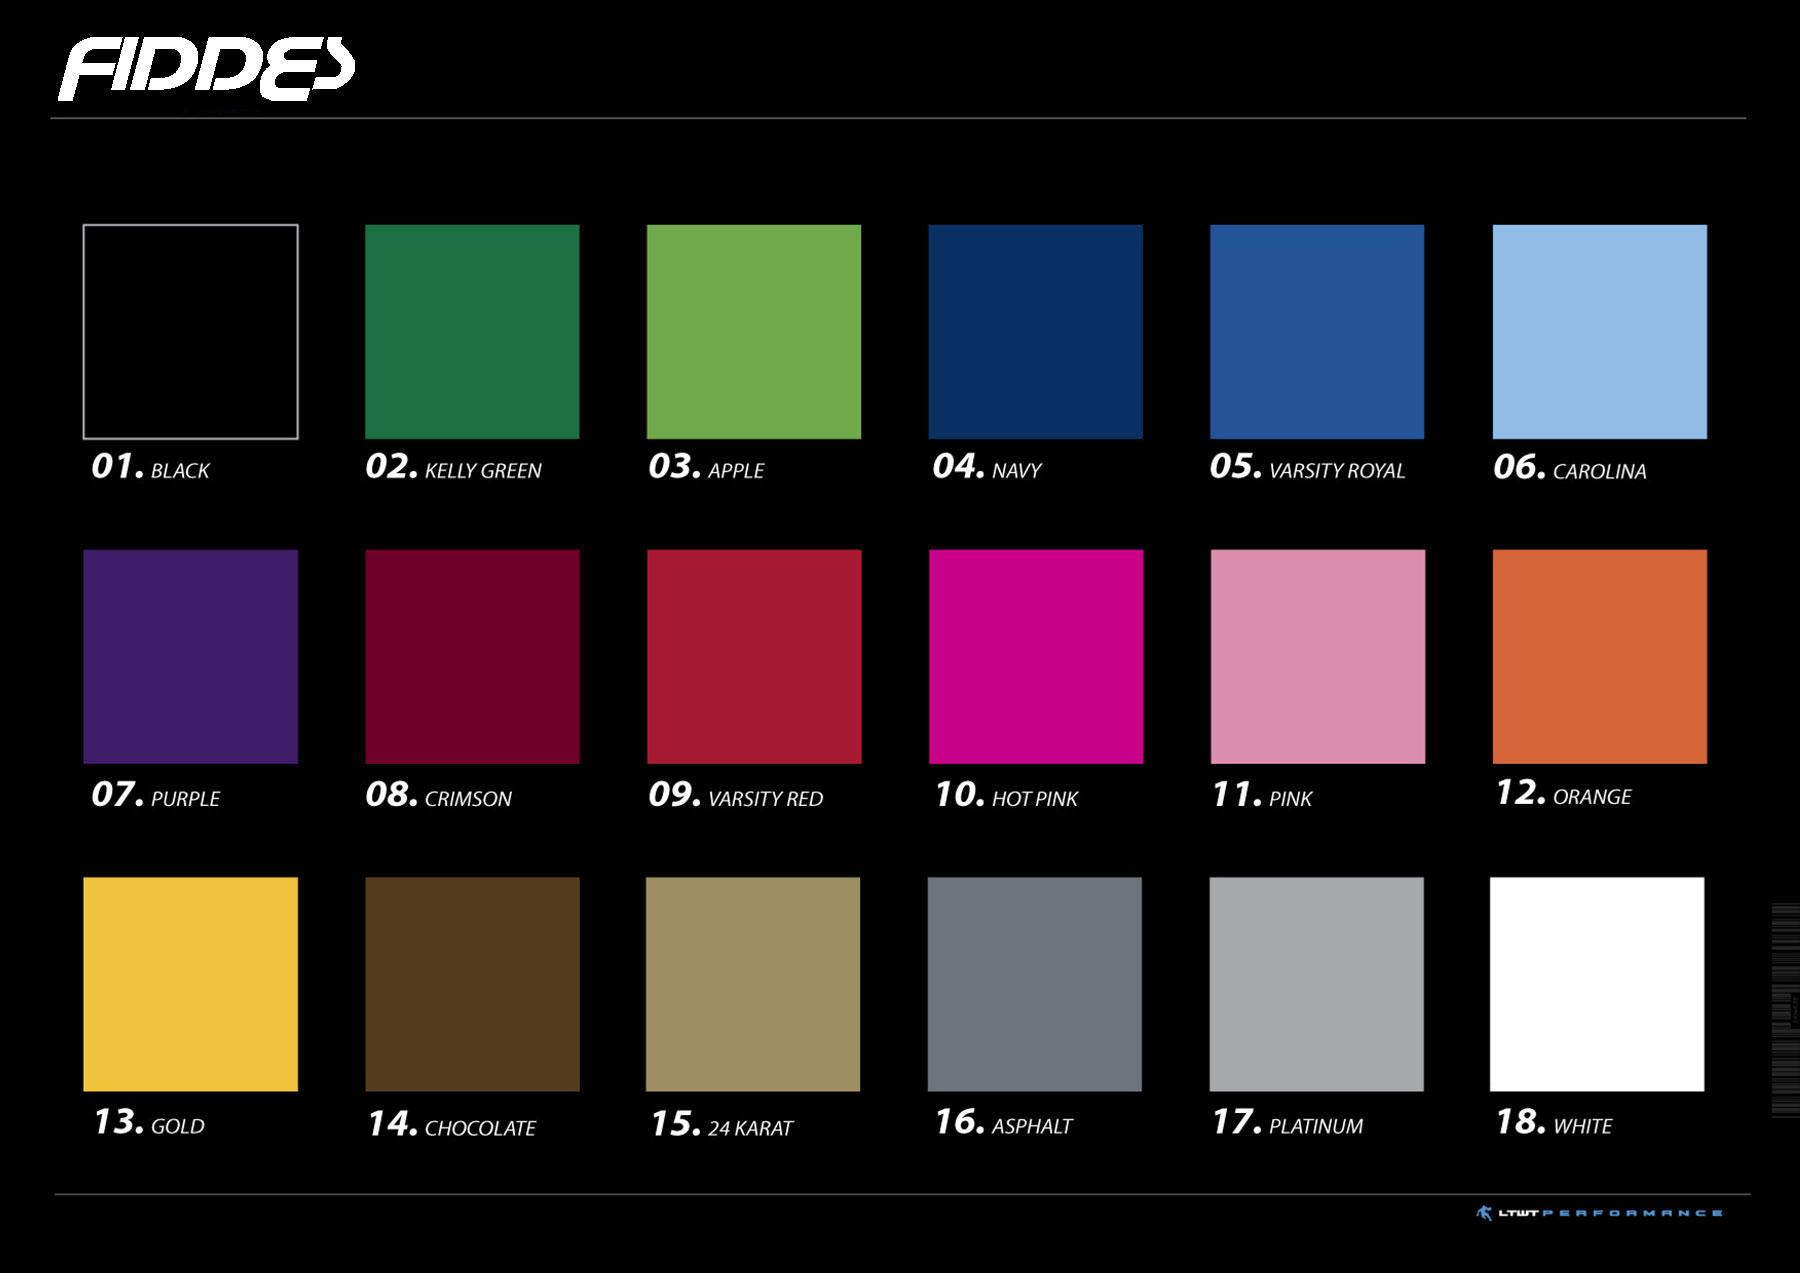 Fiddes Custom Uniform Colours